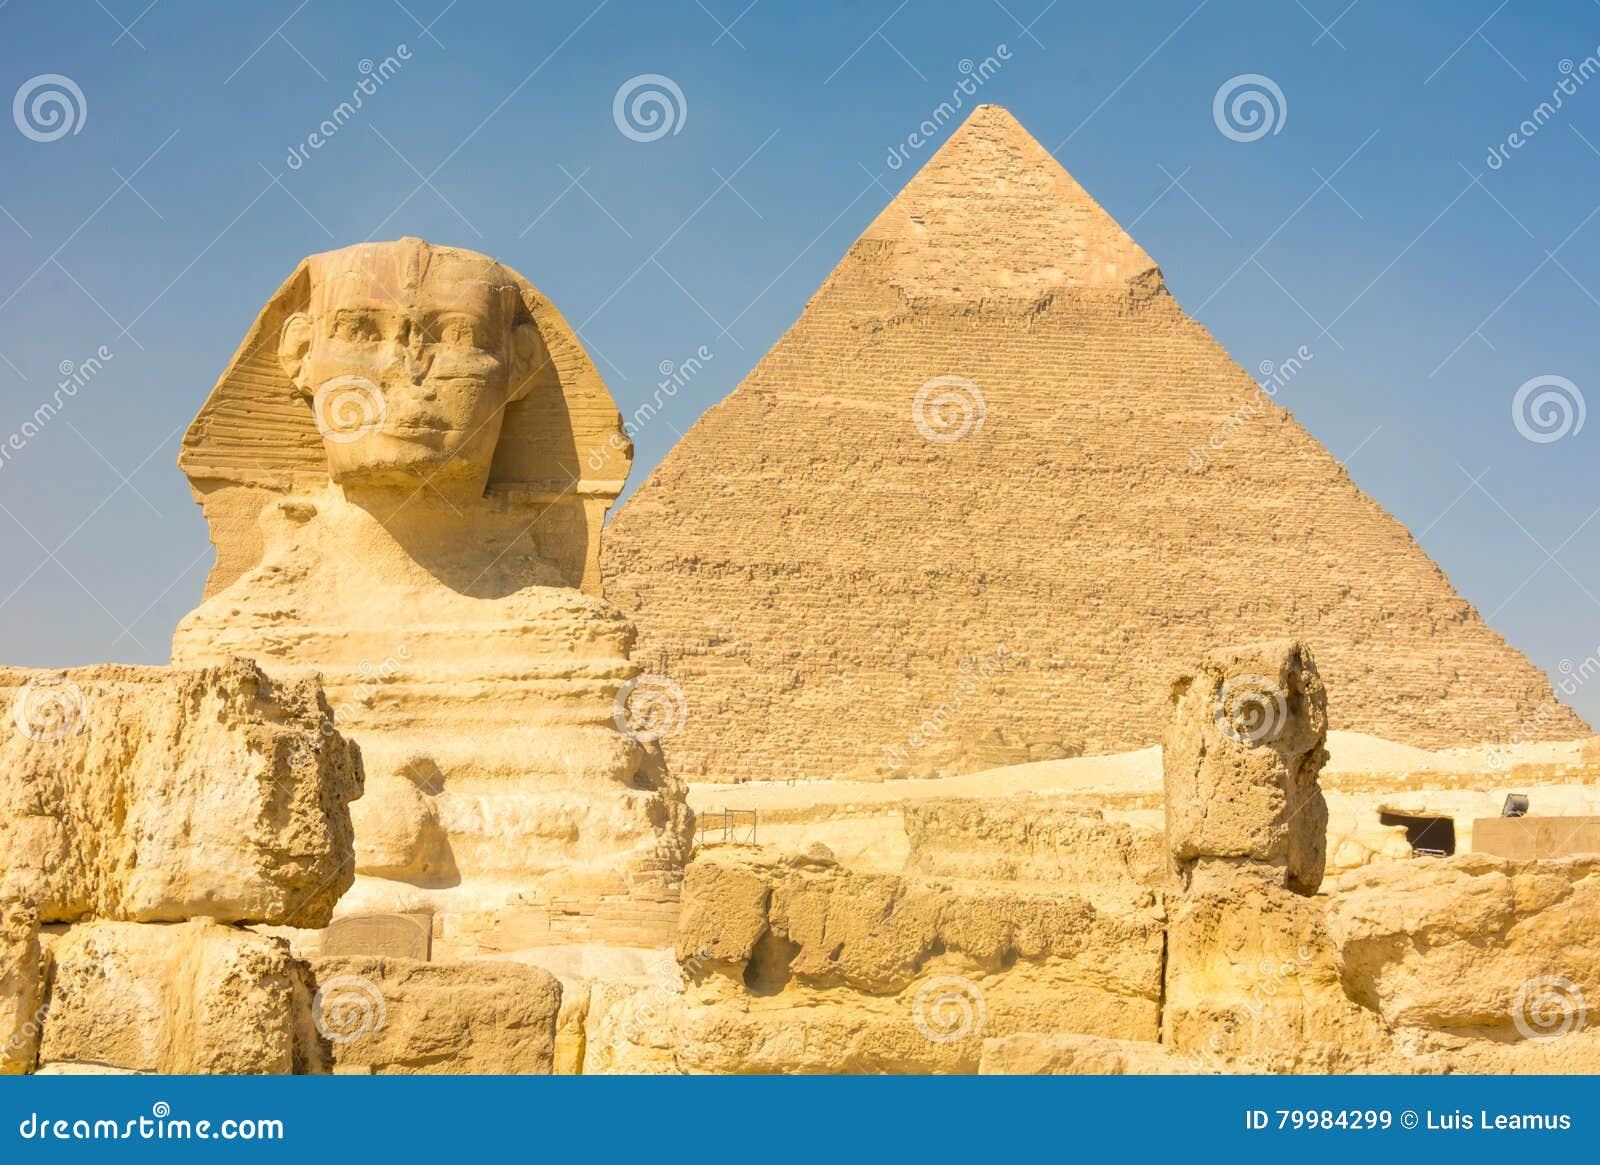 De Grote Sfinx en de Piramide van Kufu, Giza, Egypte